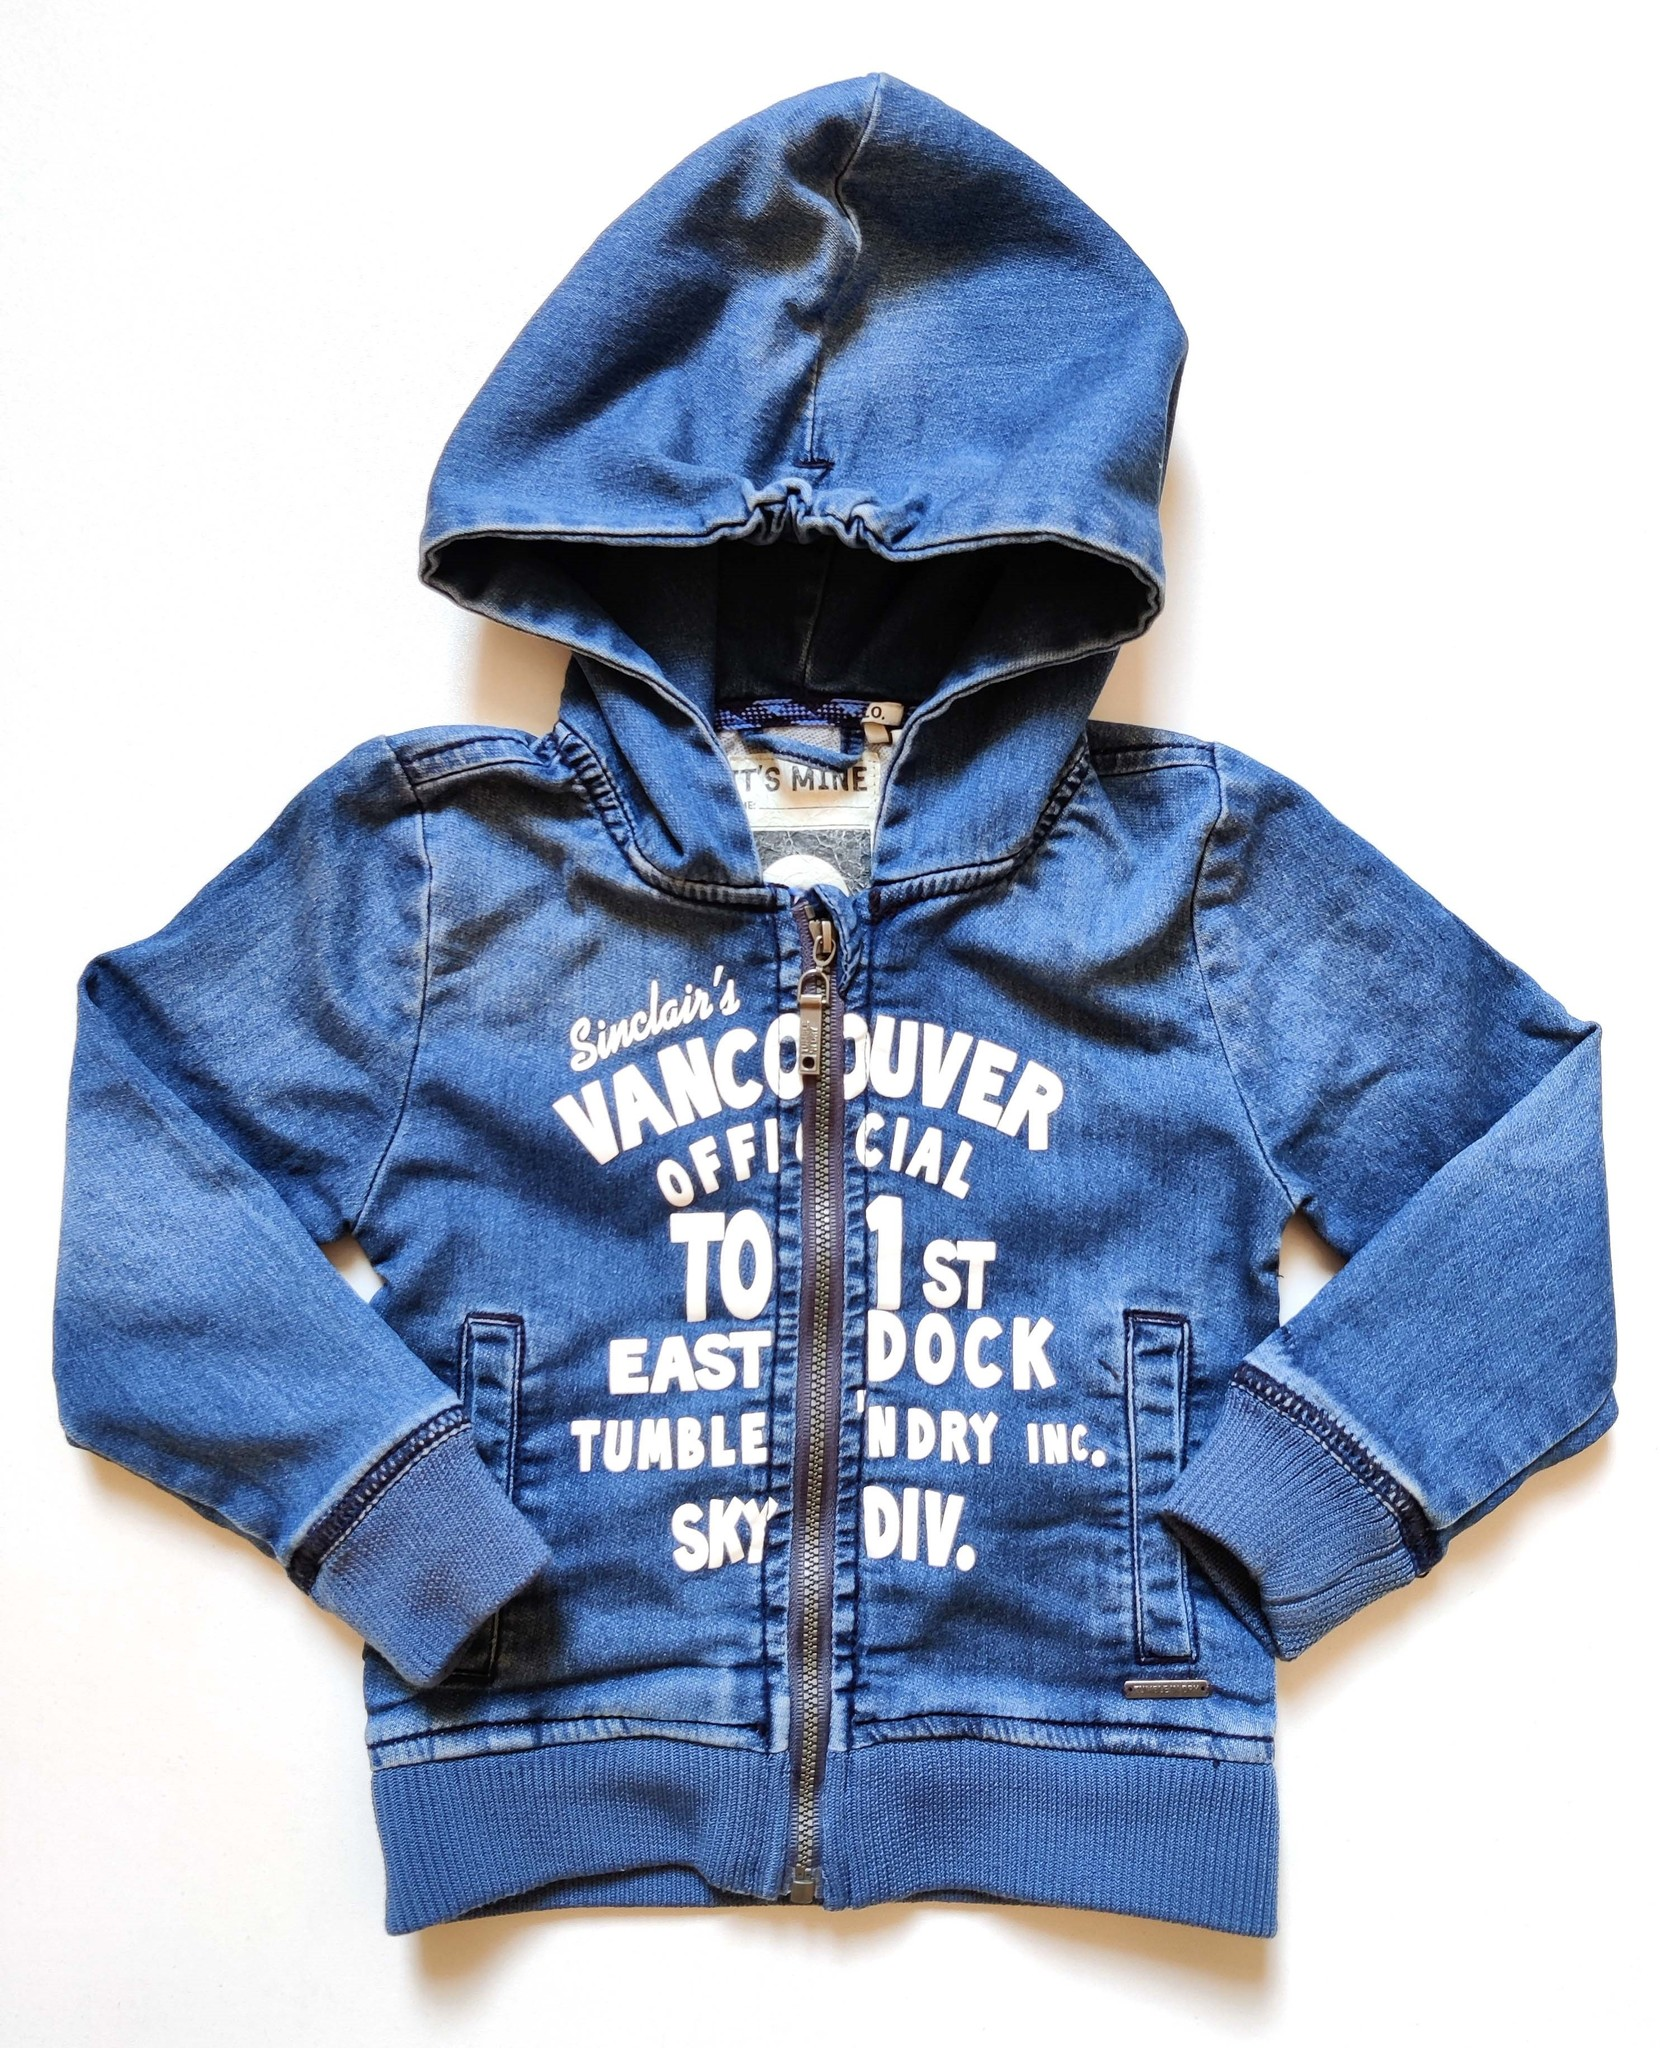 Sweater Tumble 'n Dry-1